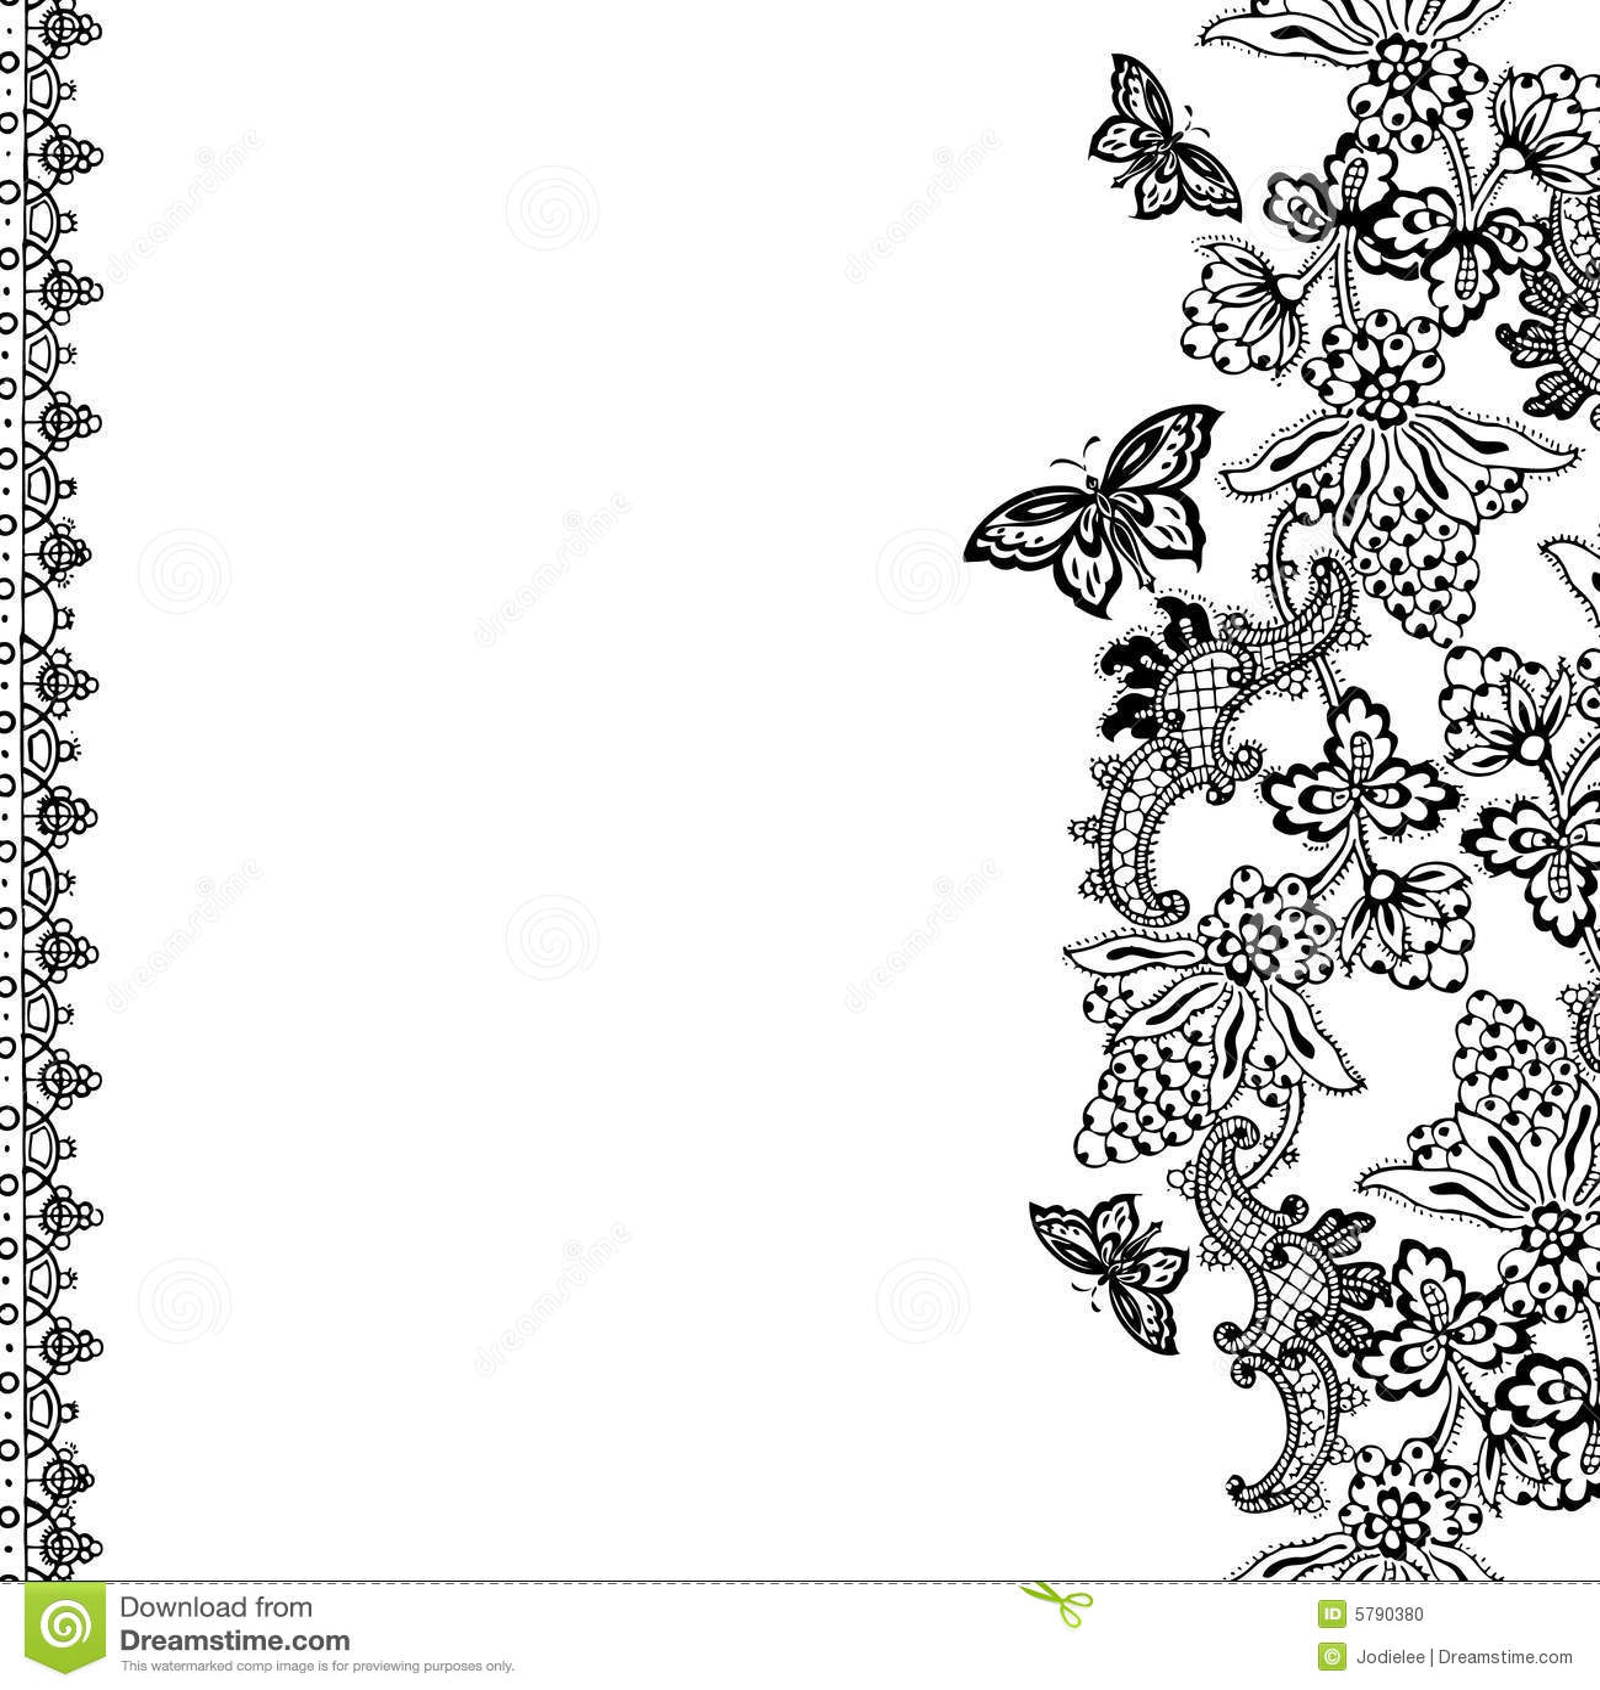 Scrapbook ideas black background - Vintage Floral Scrapbook Background Stock Photo